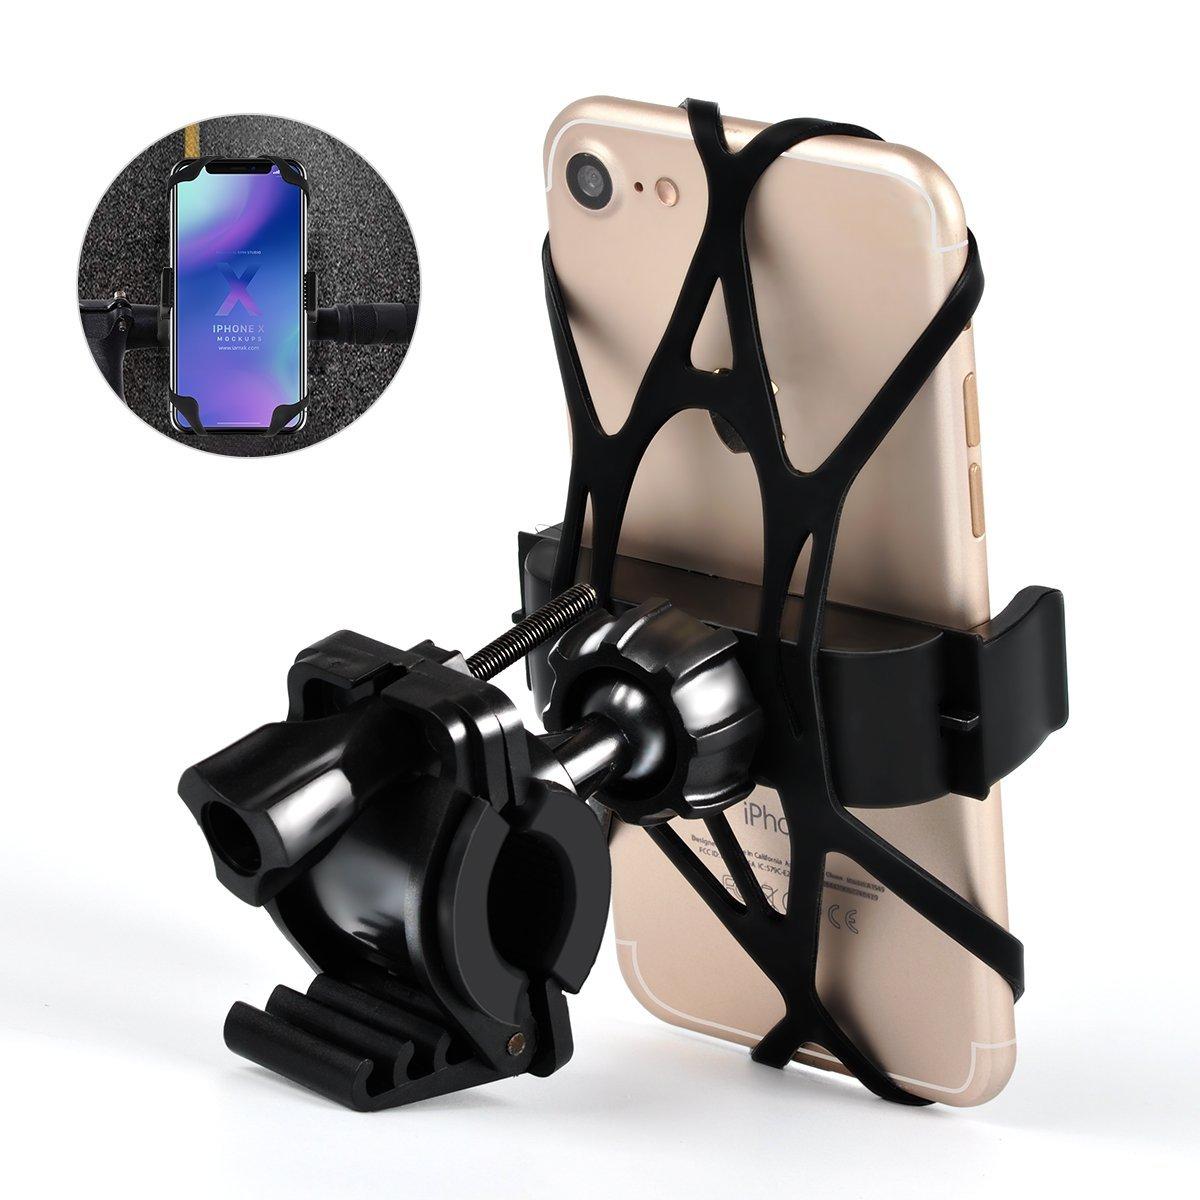 Bike Phone Mount, Bicycle & Motorcycle Phone Holder,Universal Compatible iPhone X/8/8 Plus,7/7 Plus,6/6s Plus,Galaxy S7/S6 Other 4-6.0 Smartphones (Black) Cornmi